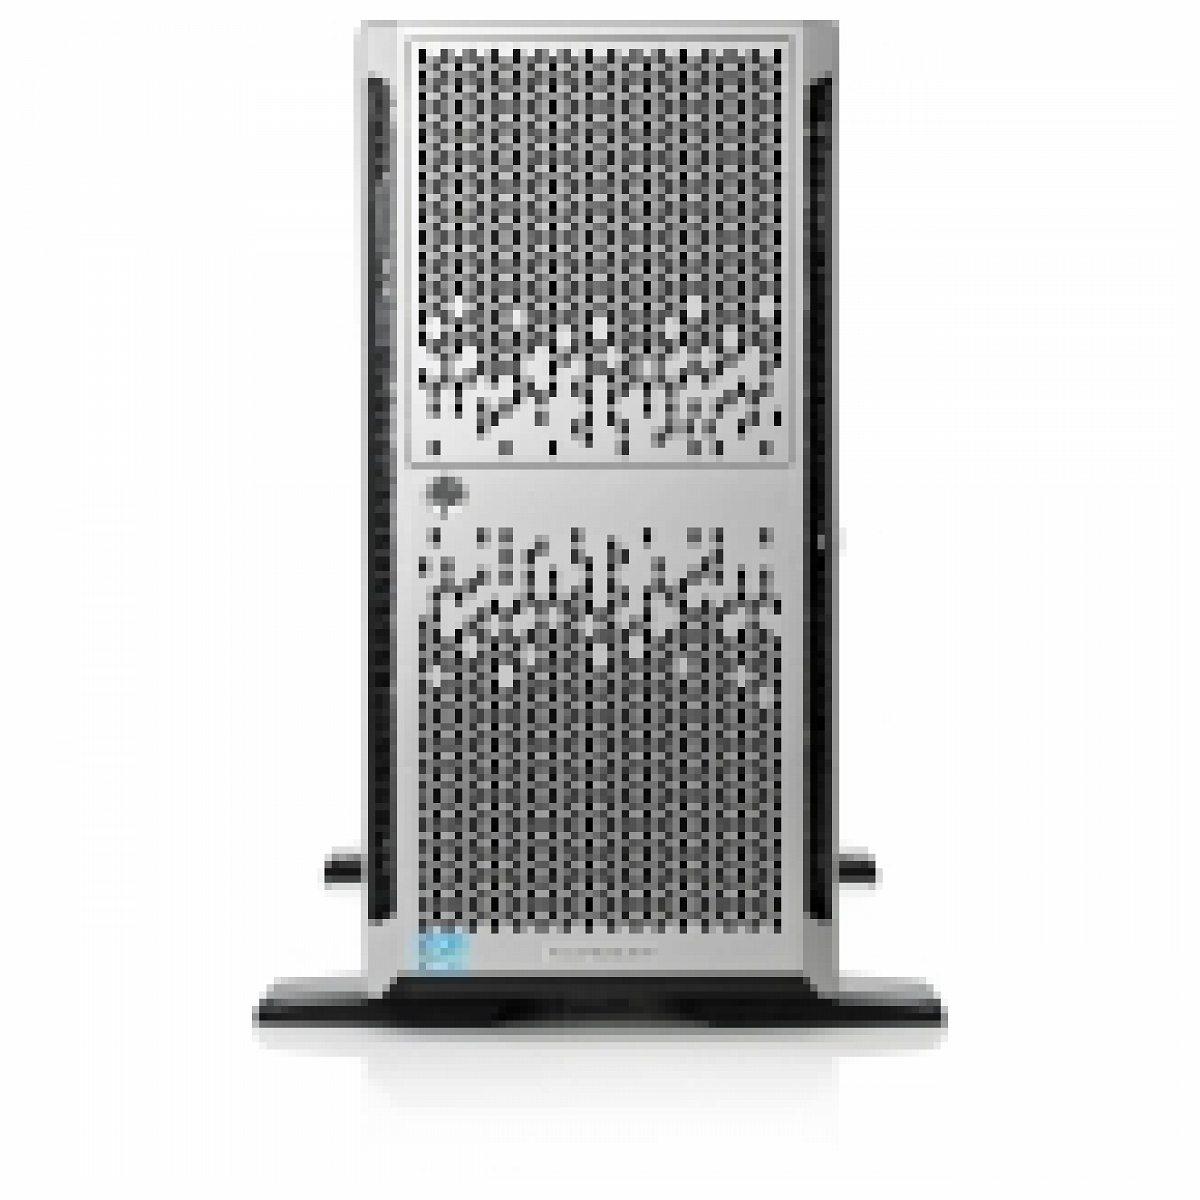 HPE 777883-S01 HP ProLiant ML350p Gen8 E5-2609v2 2.5GHz 4-core 1P 8GB-R P42